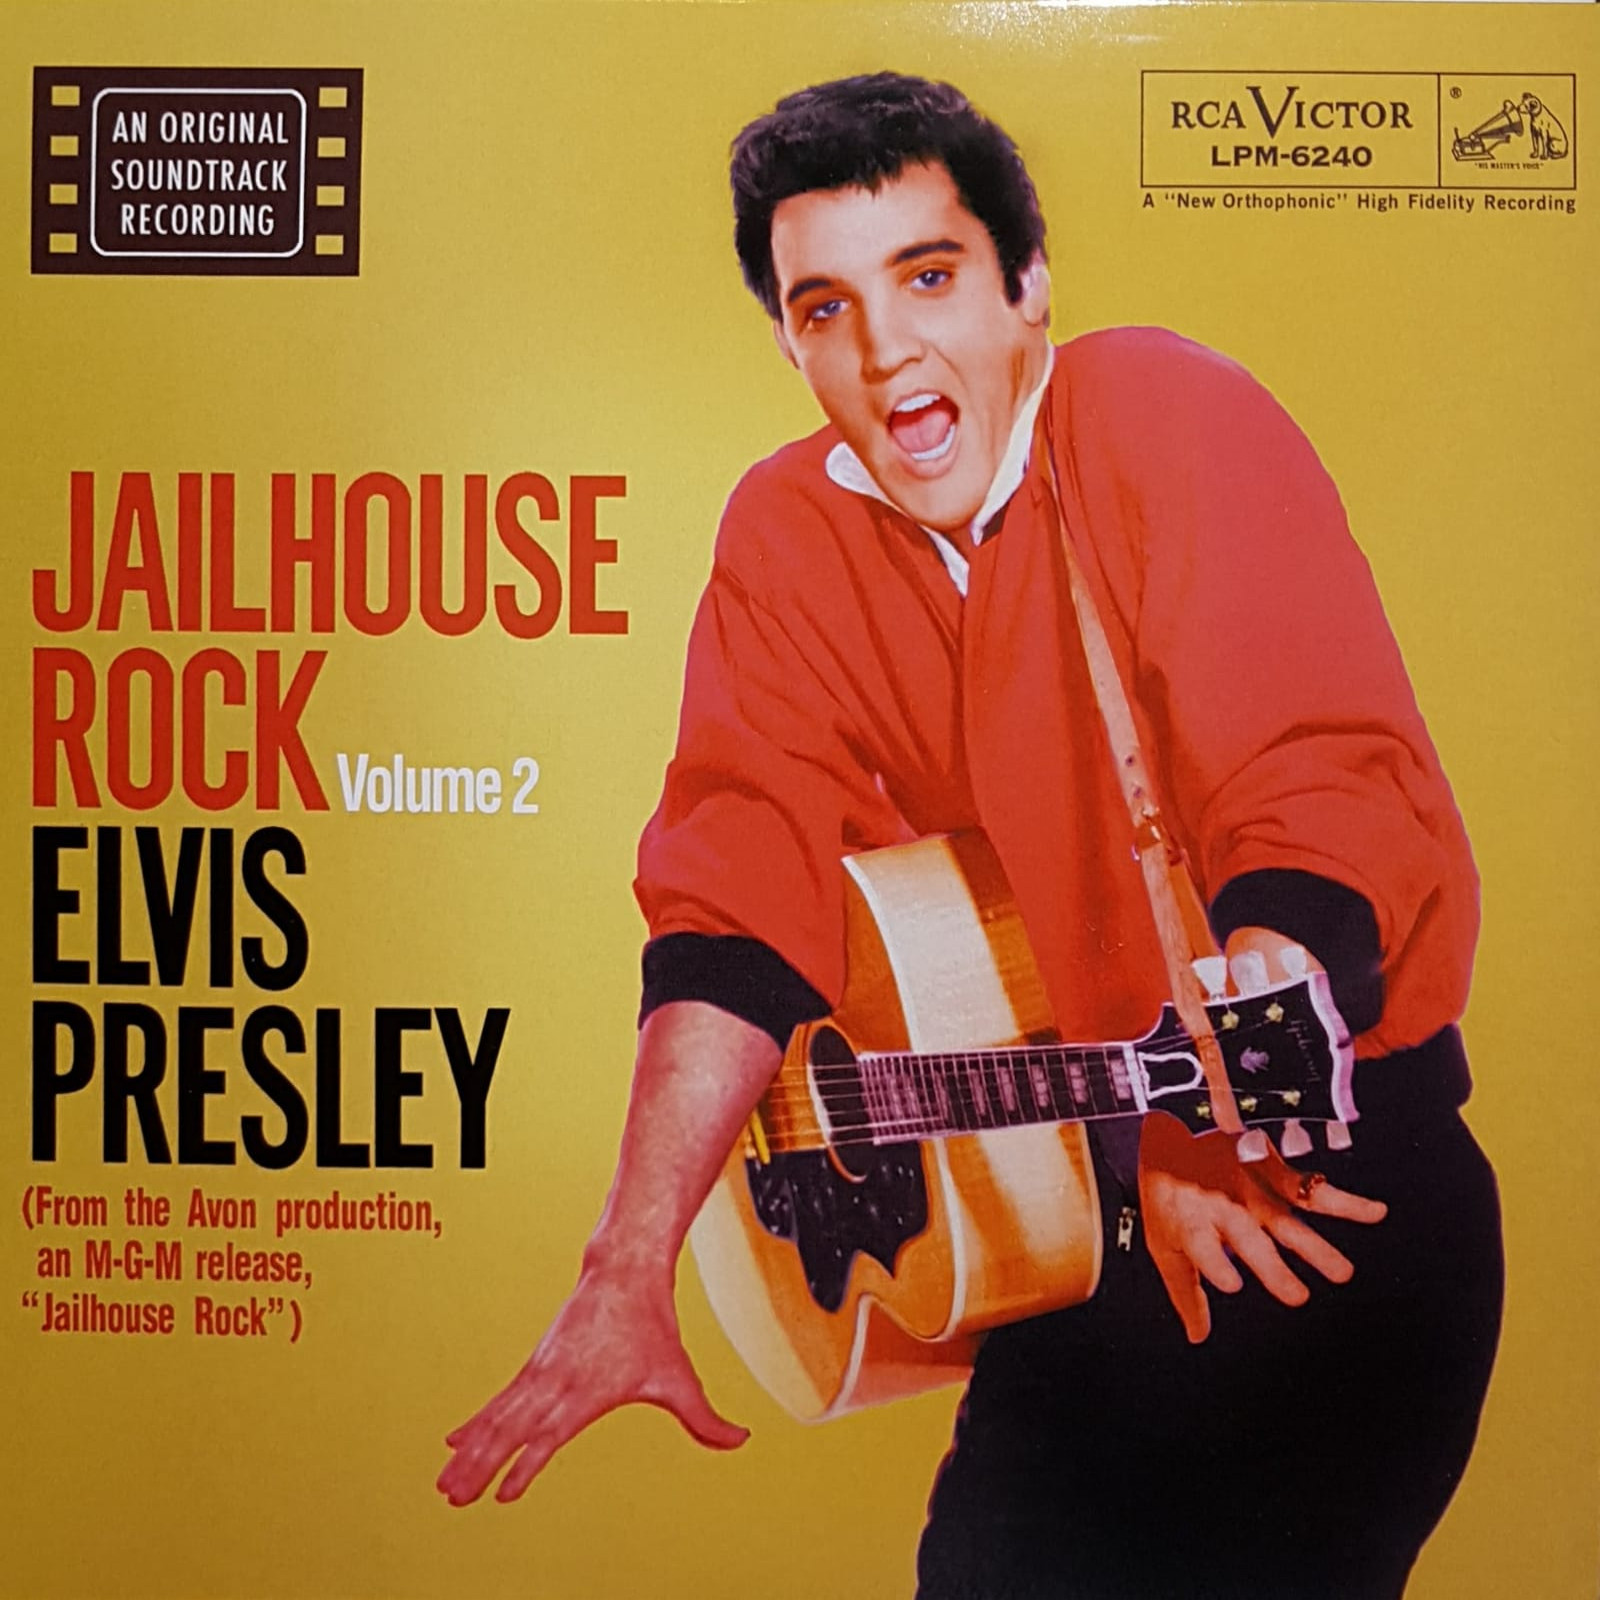 JAILHOUSE ROCK VOL. 2 Jailhouserock02ftd01lwk8y